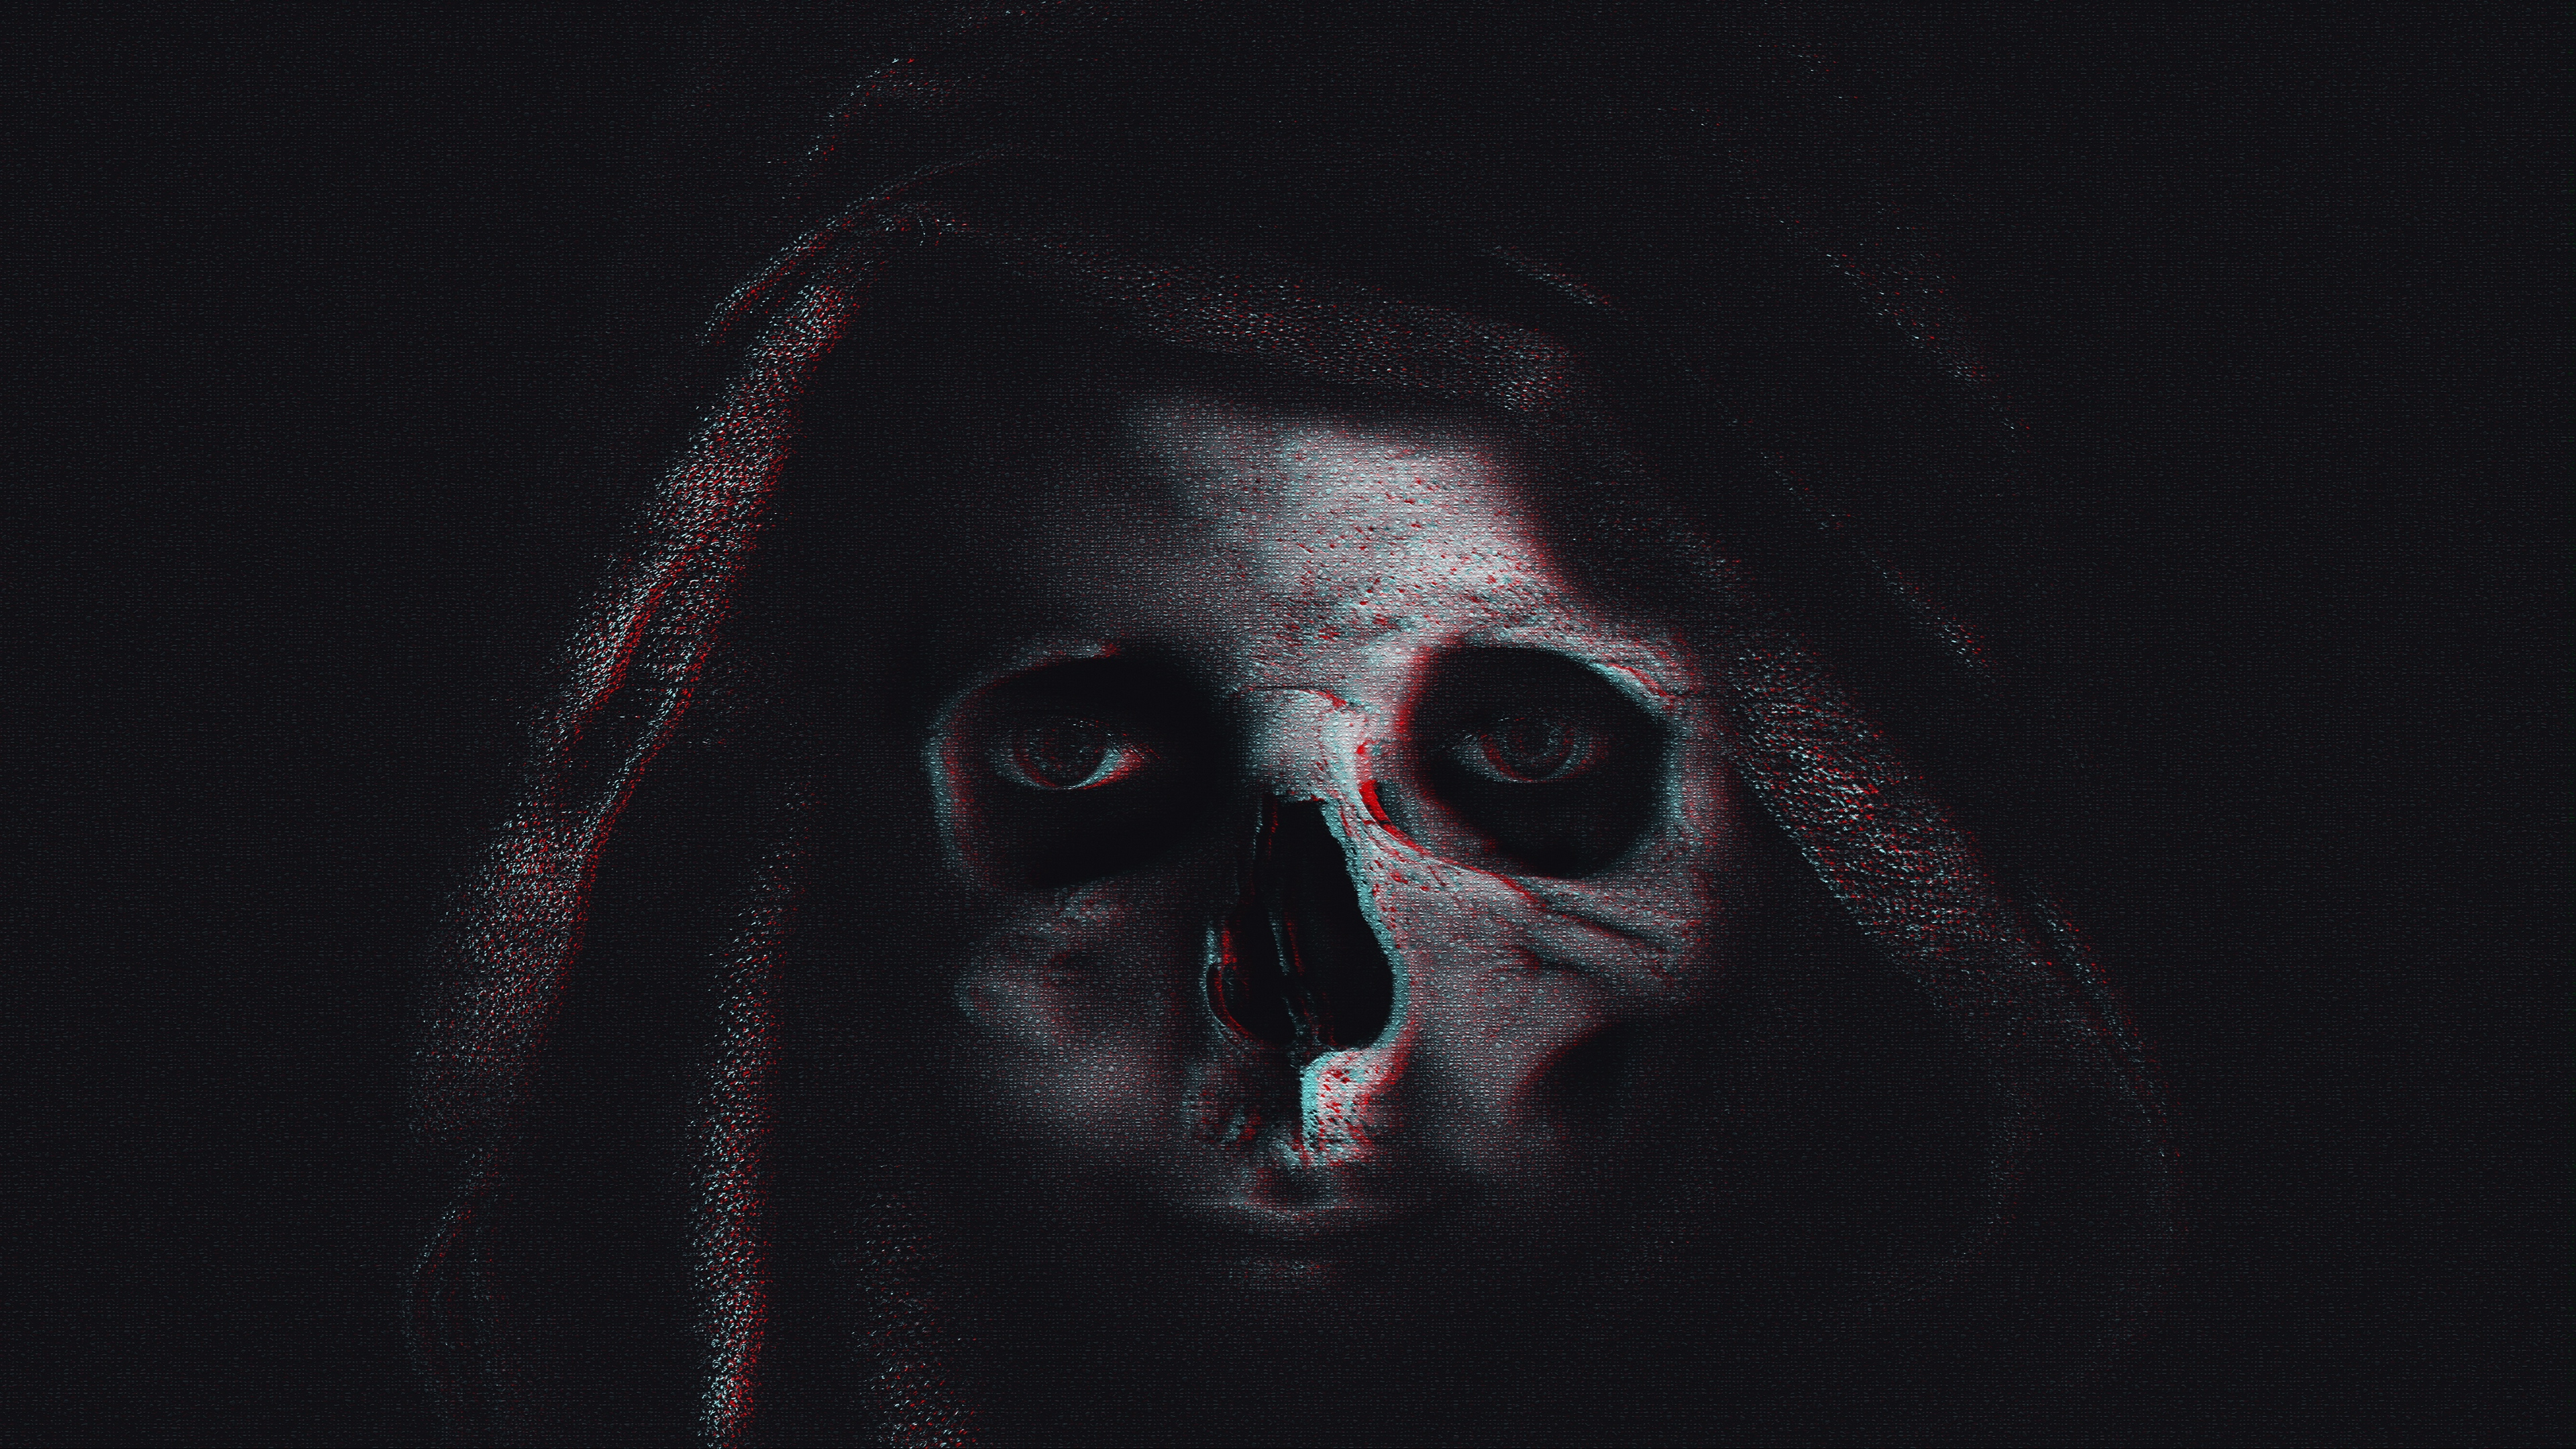 skull hood glitch noise 4k 1540575234 - skull, hood, glitch, noise 4k - Skull, Hood, glitch